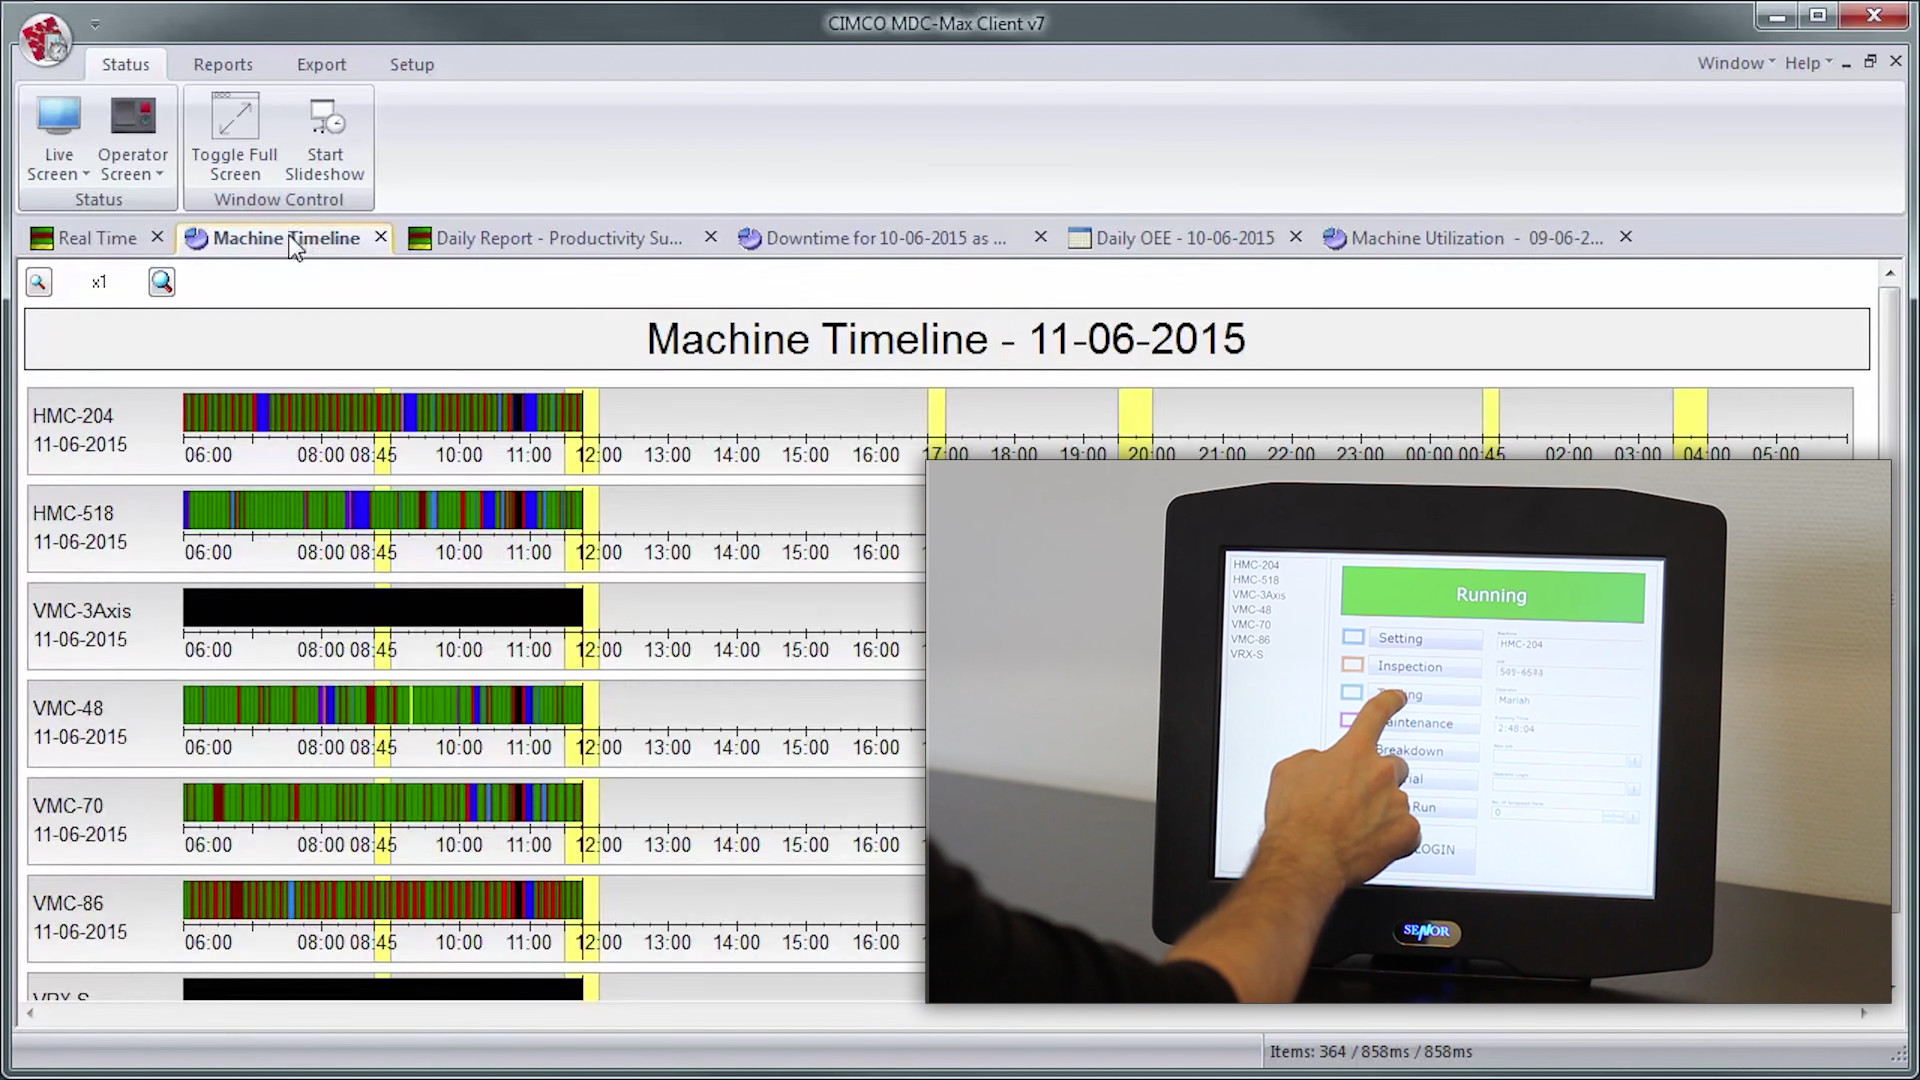 cimco-mdc-max-main-video-690x3582